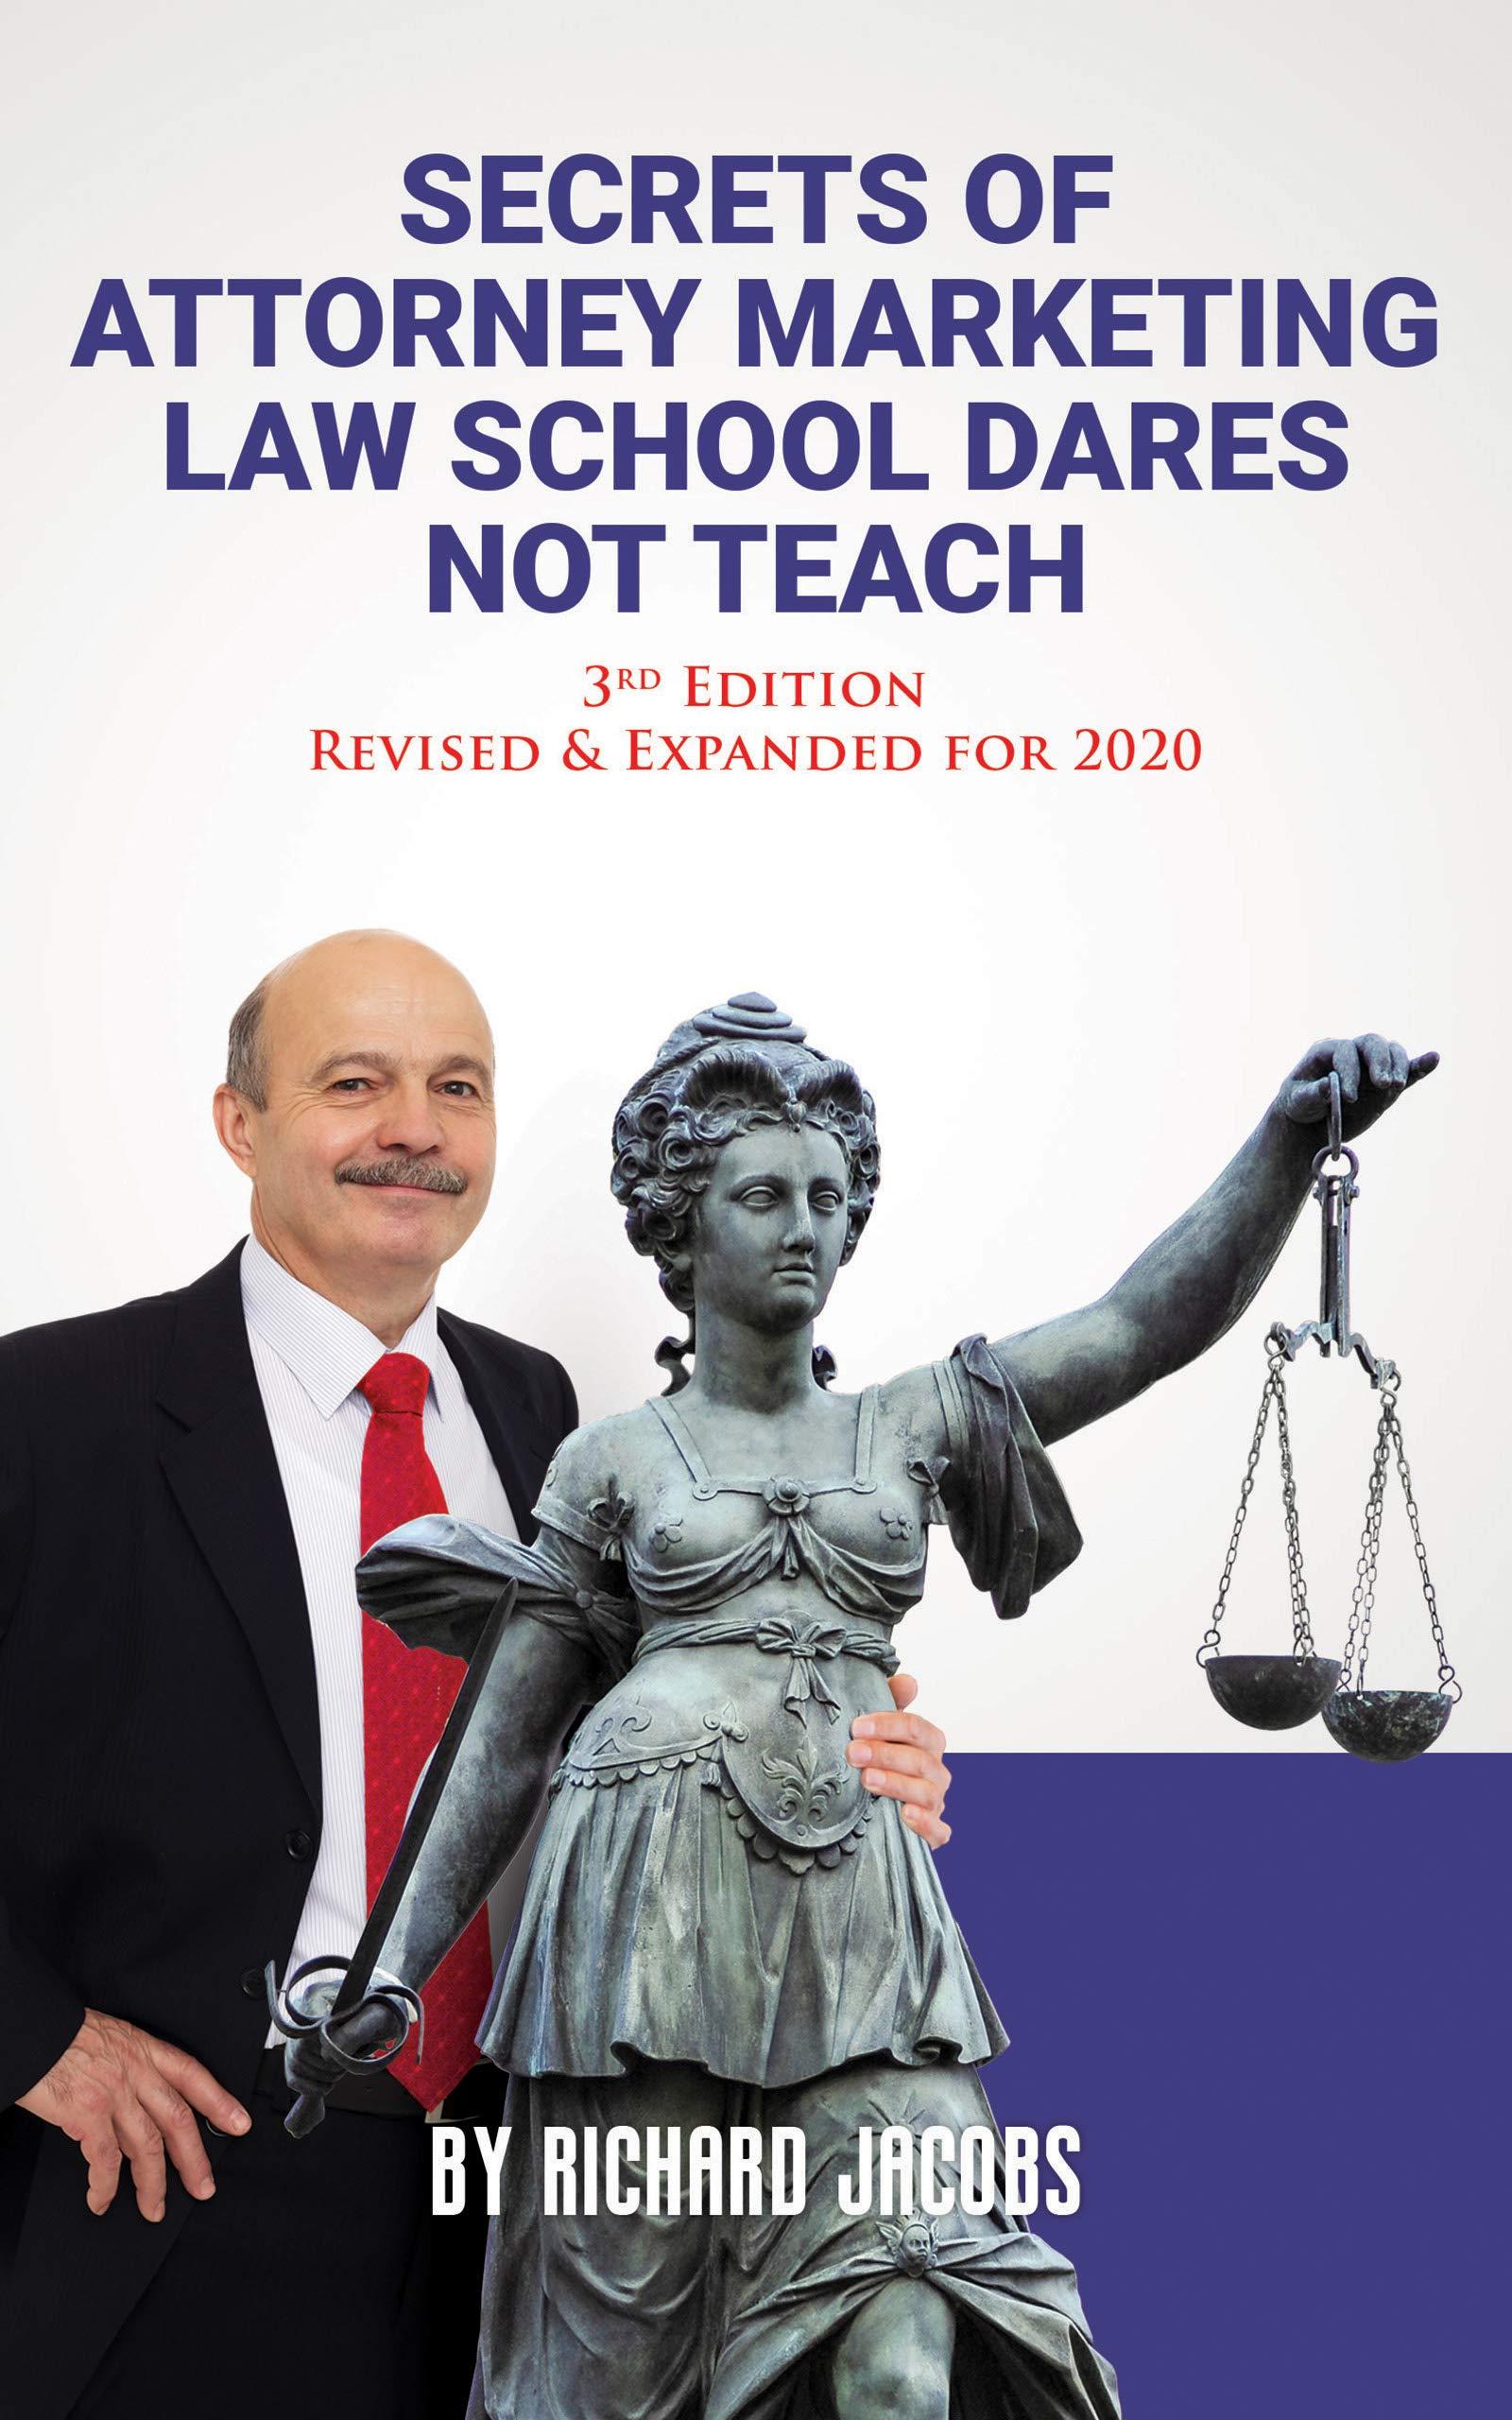 Secrets of Attorney Marketing Law School Dares Not Teach: (3rd Edition – 2020 Update)